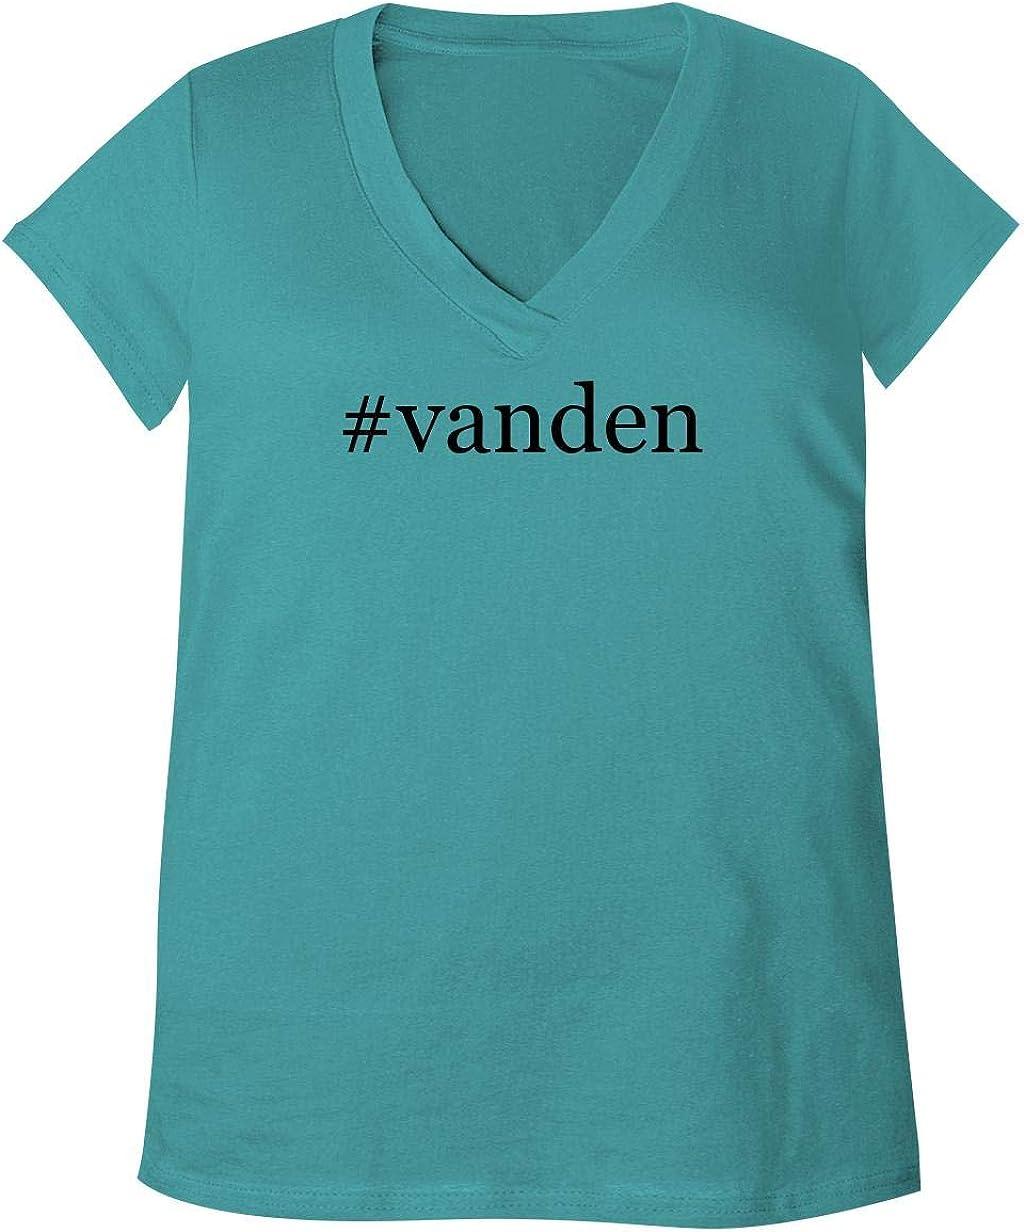 #Vanden - Adult Bella + Canvas B6035 Women's V-Neck T-Shirt 615U0WpfwPL